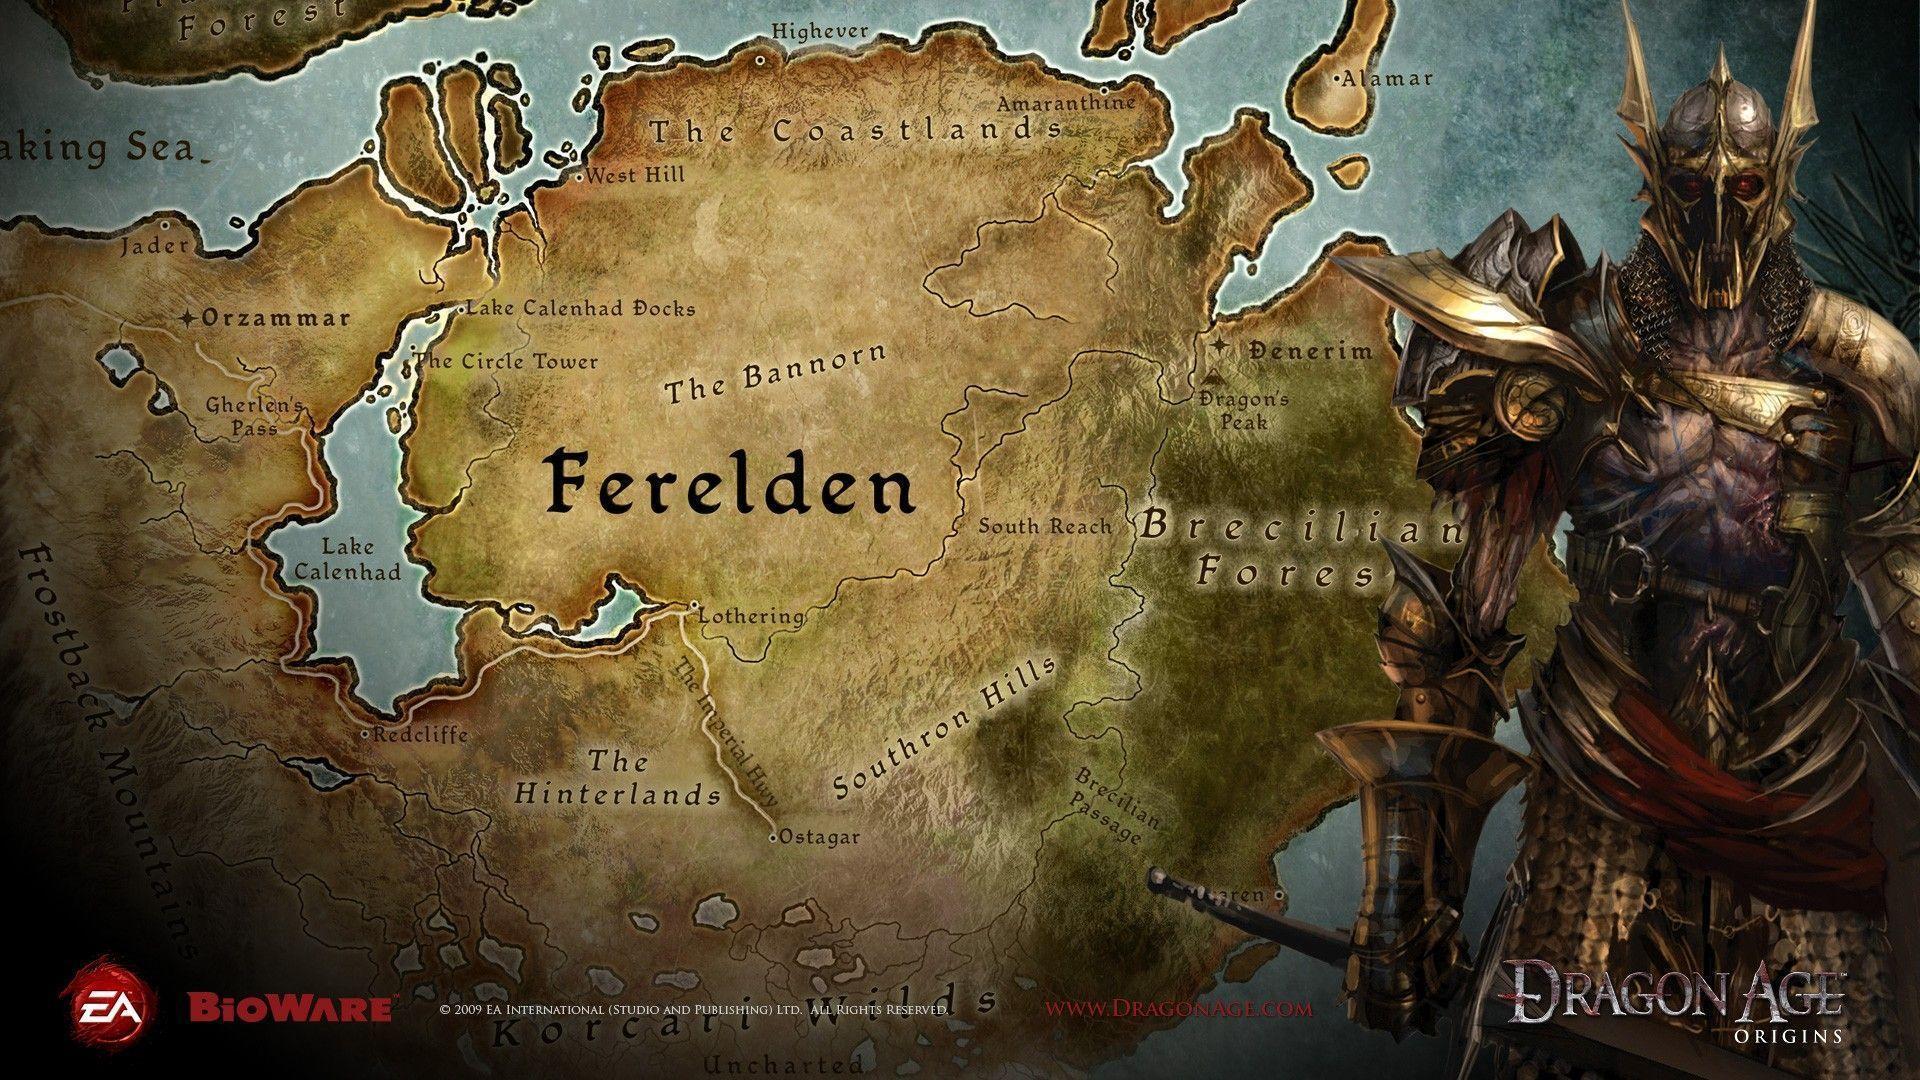 Dragon Age Origins Wallpapers Hd Wallpaper Cave